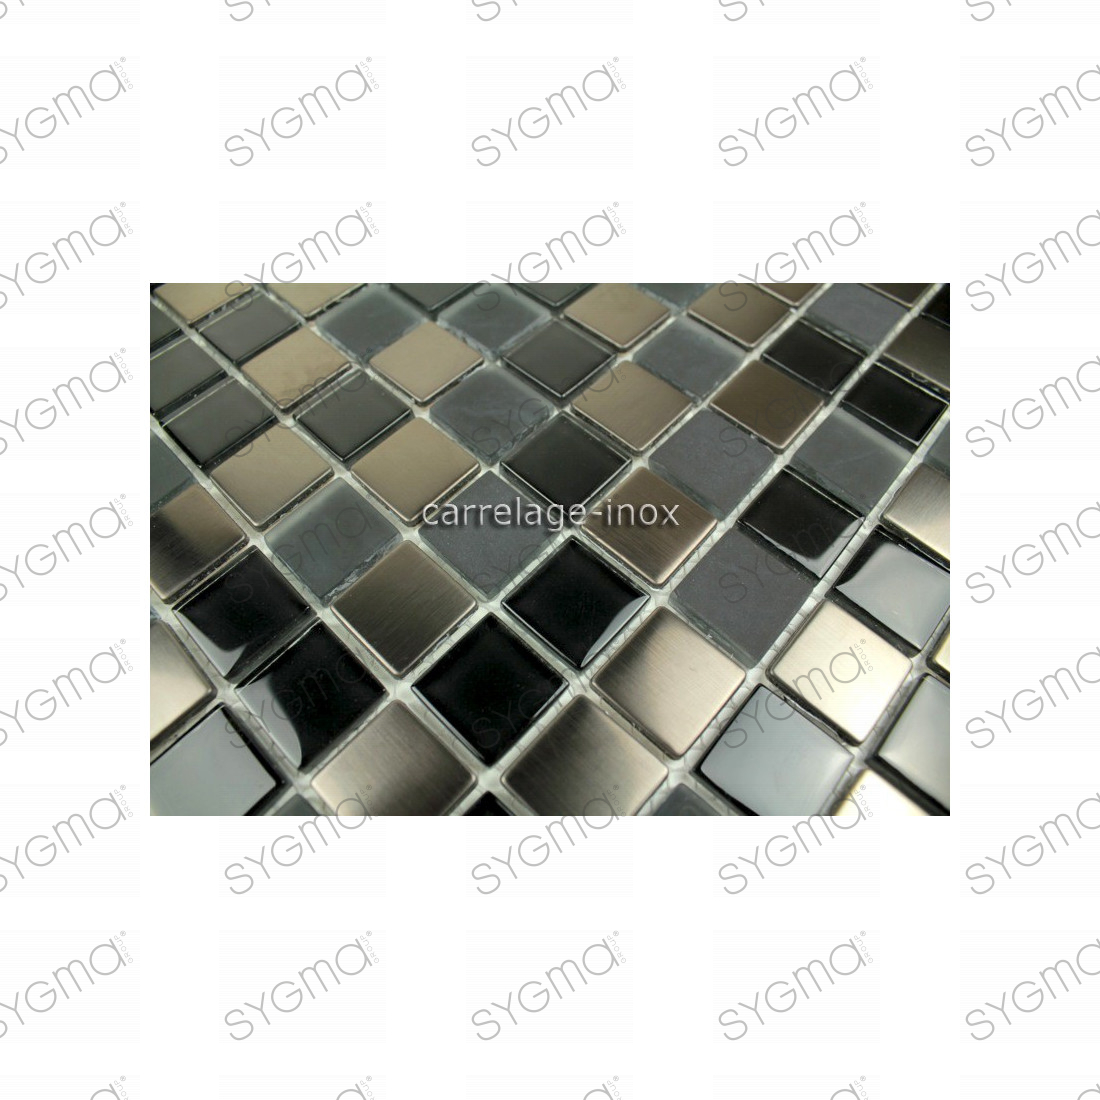 Mosaique et carrelage inox faience cuisine doblo noir for Carrelage inox